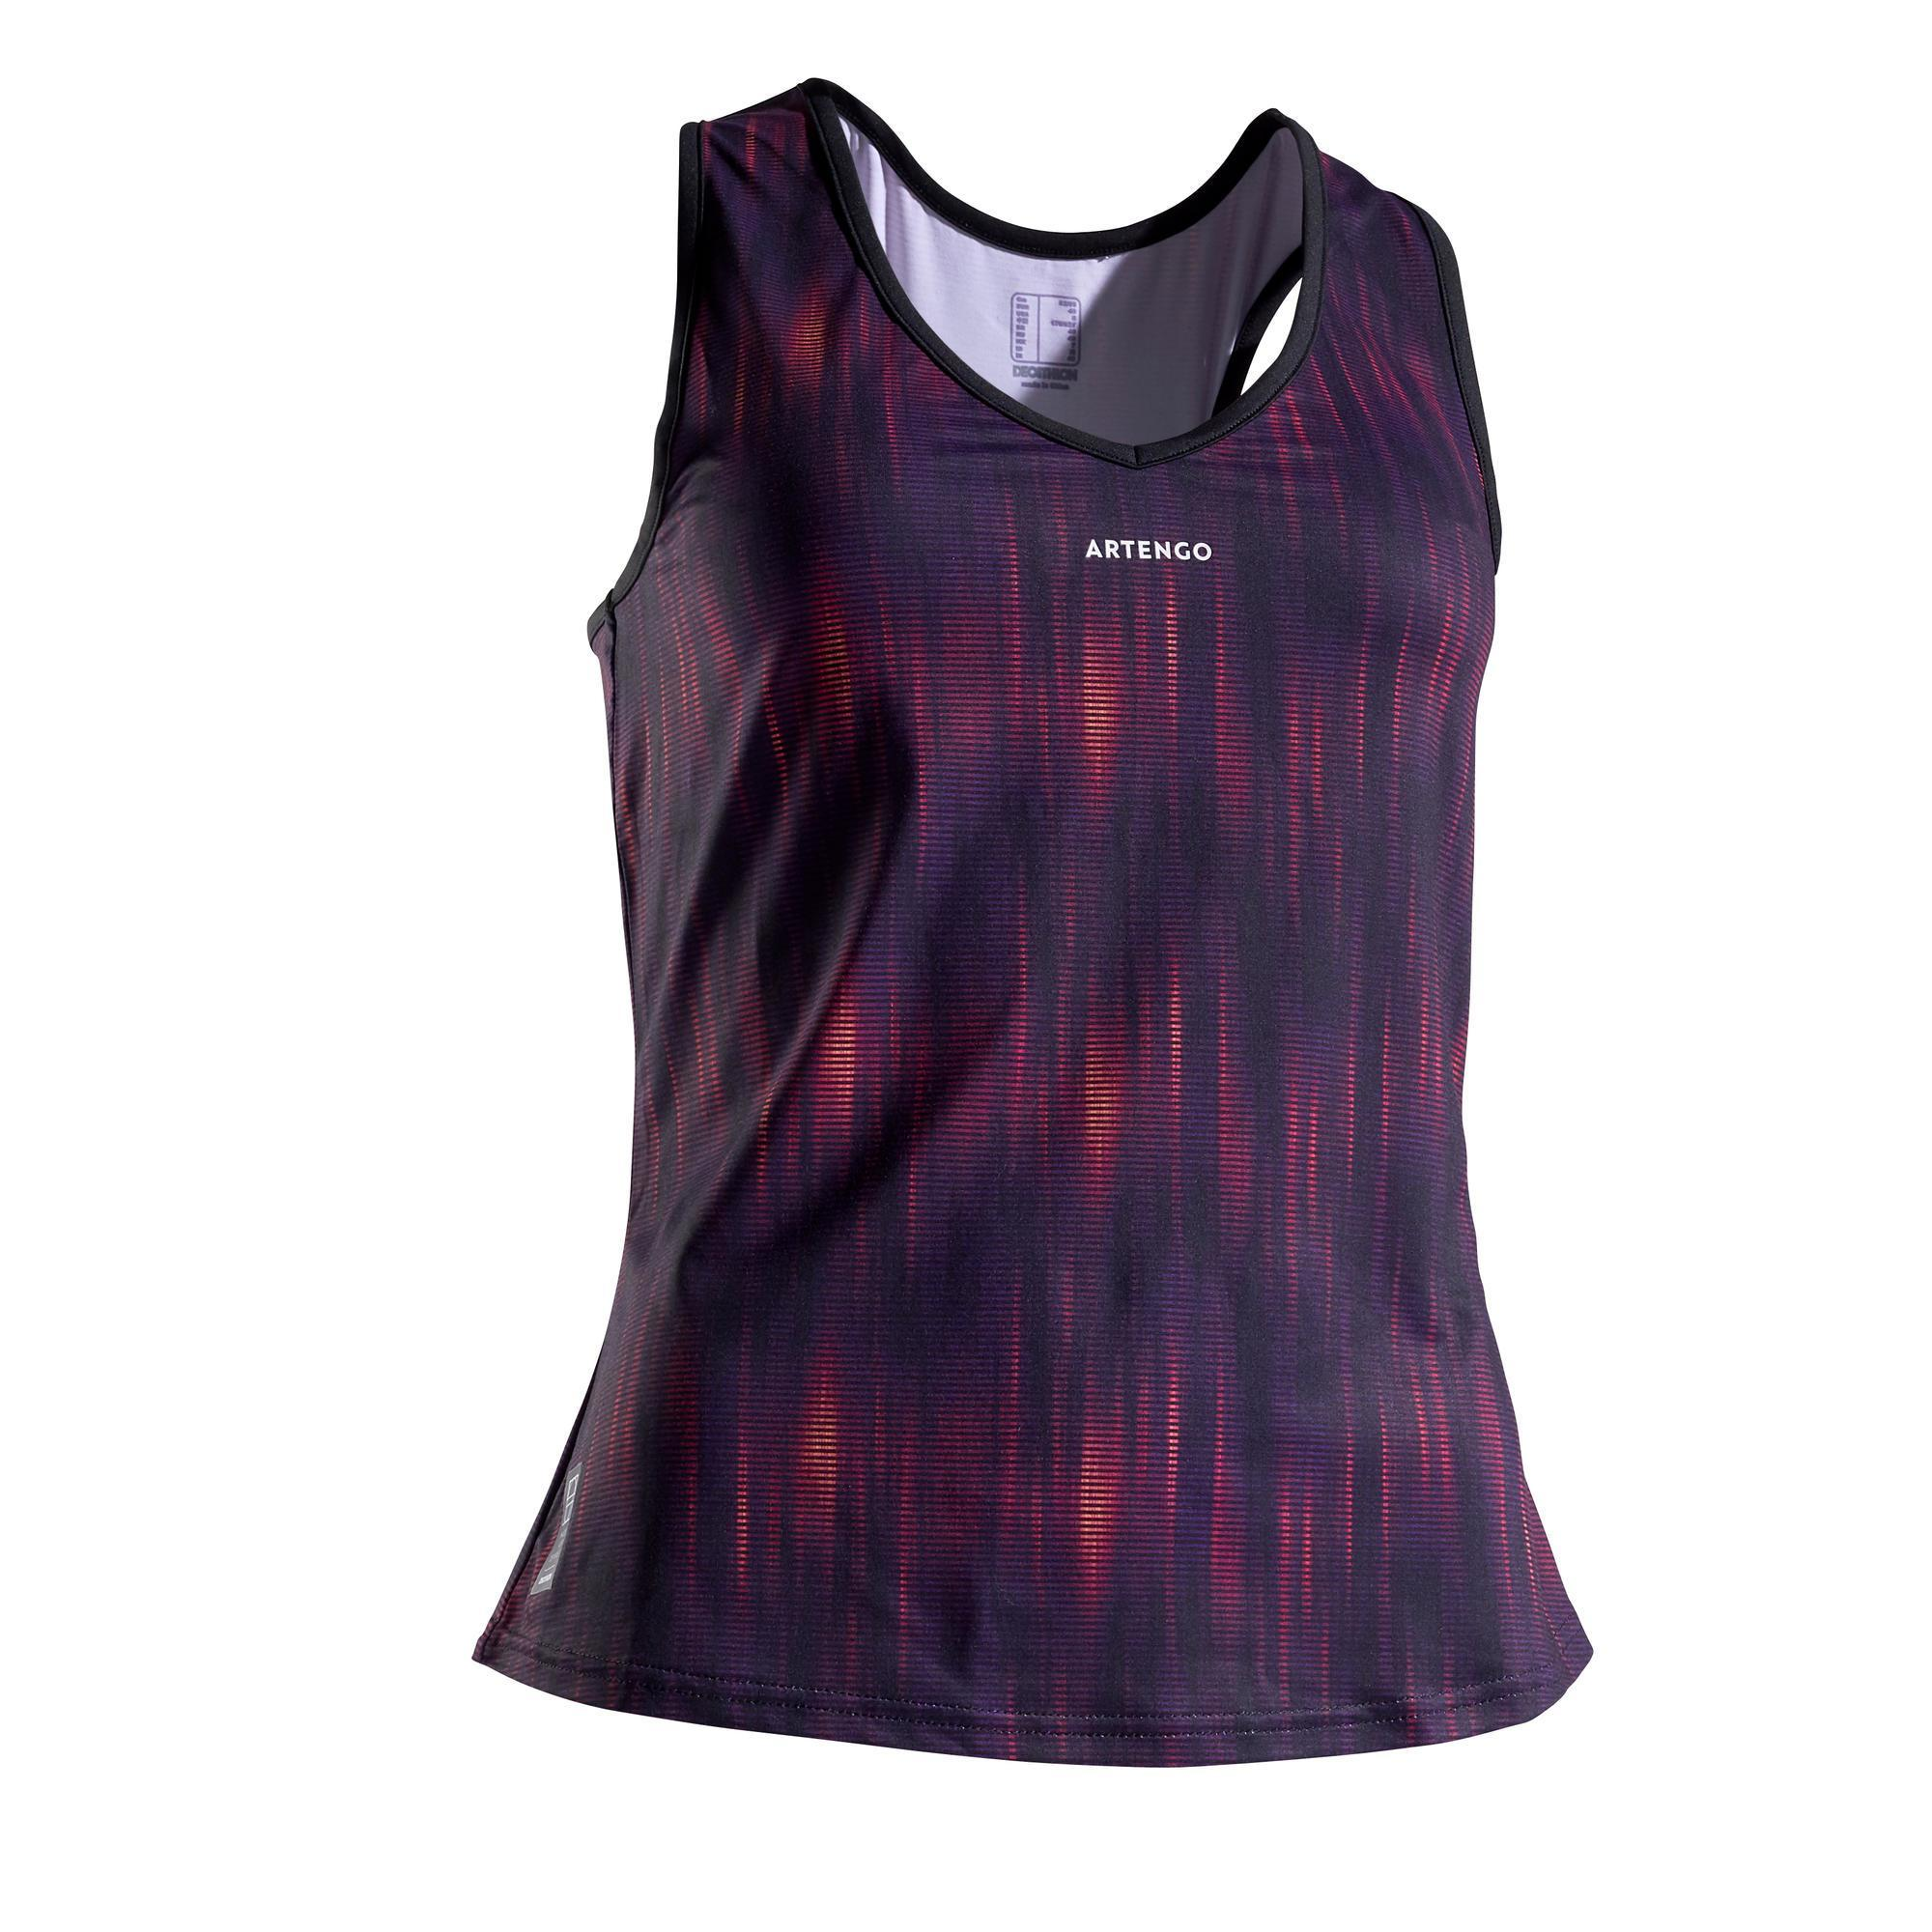 Tennis-Top TK Light 900 Damen violett/orange | Sportbekleidung > Sporttops > Tennistops | Artengo